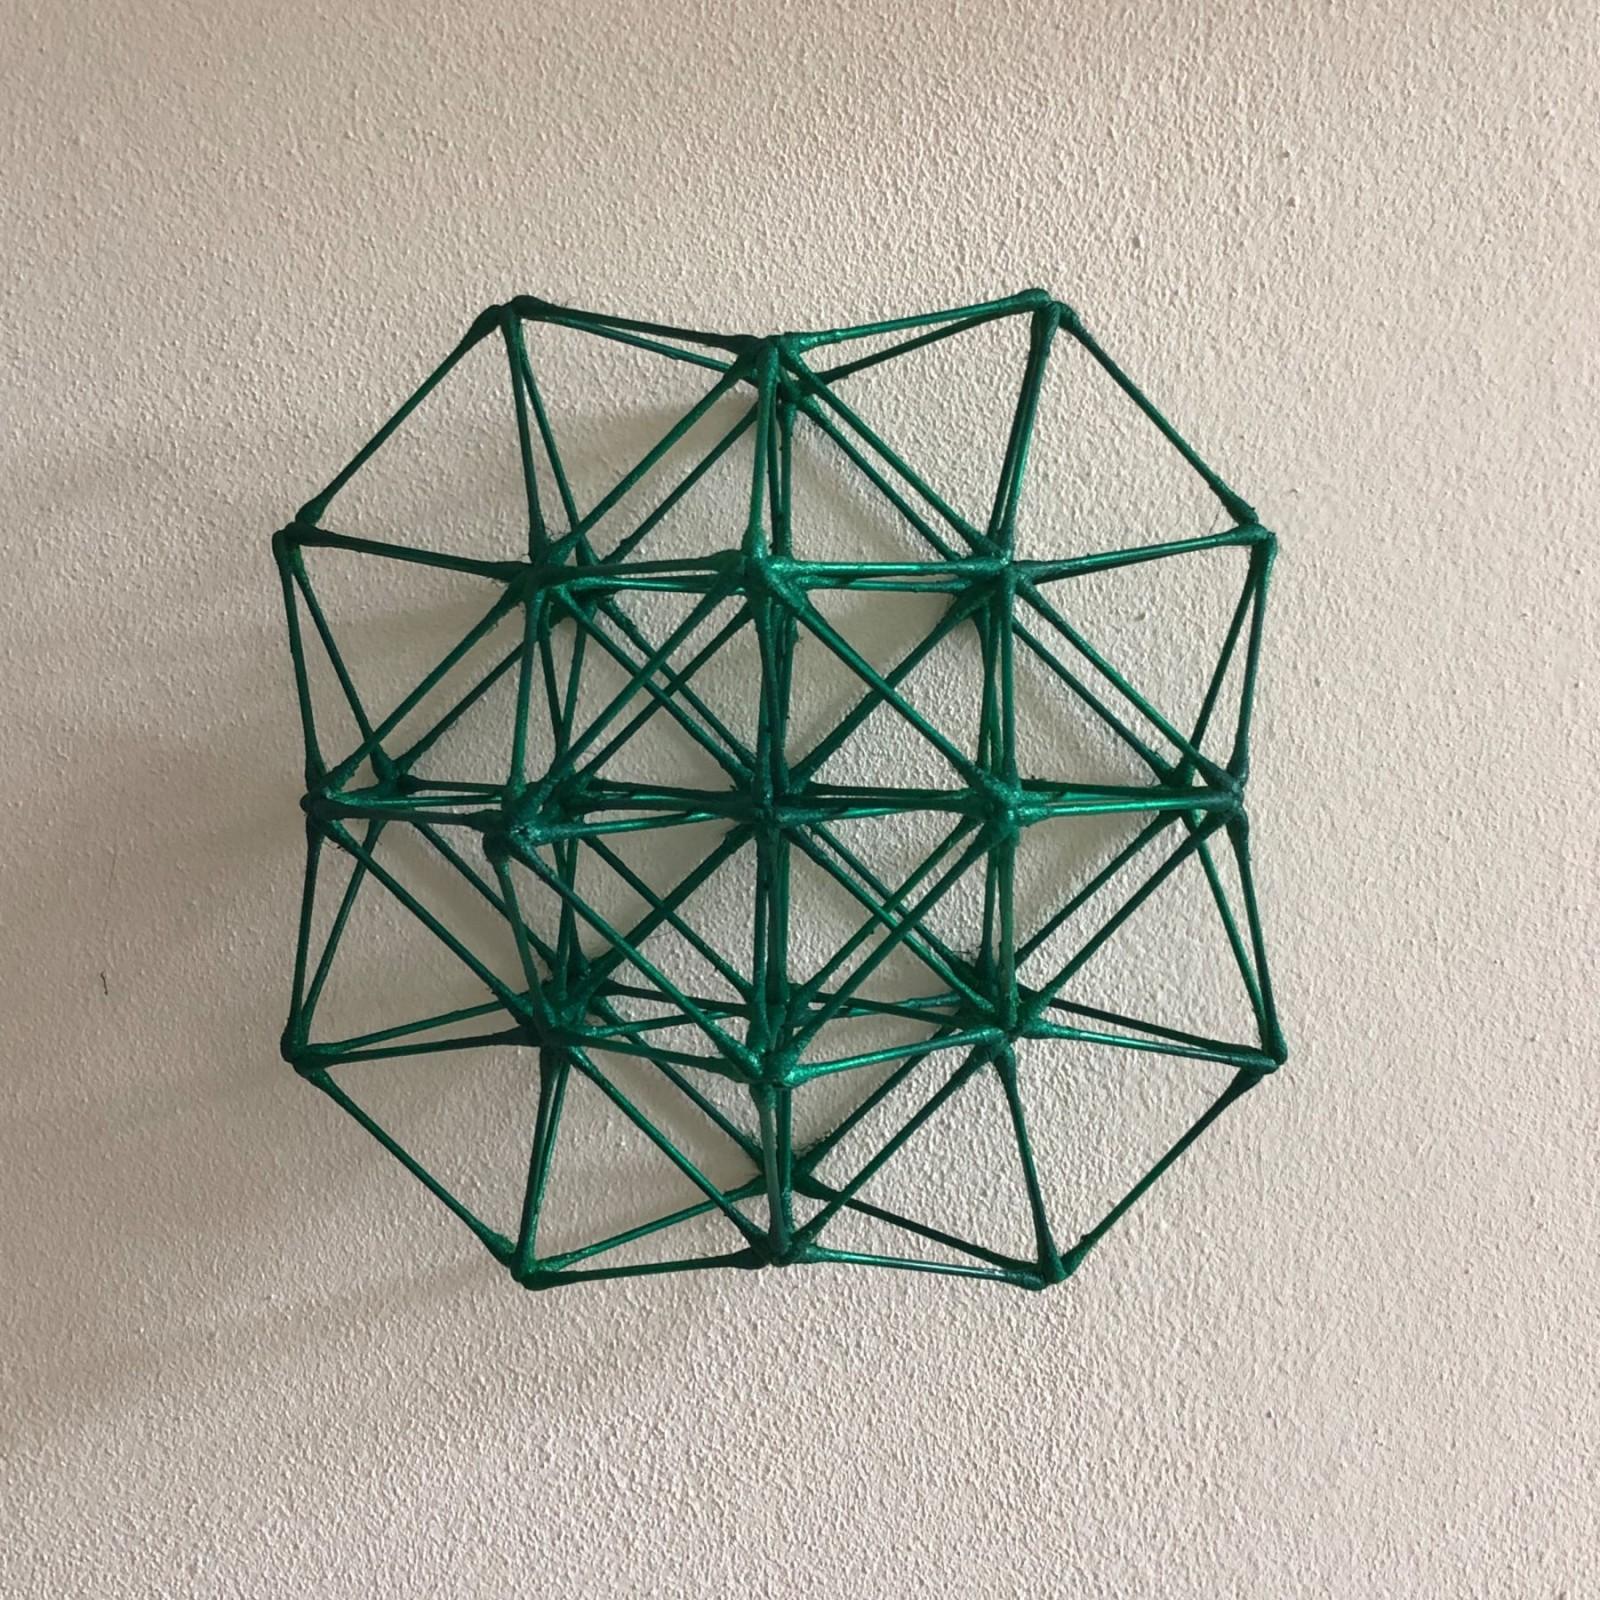 Construction (Green)